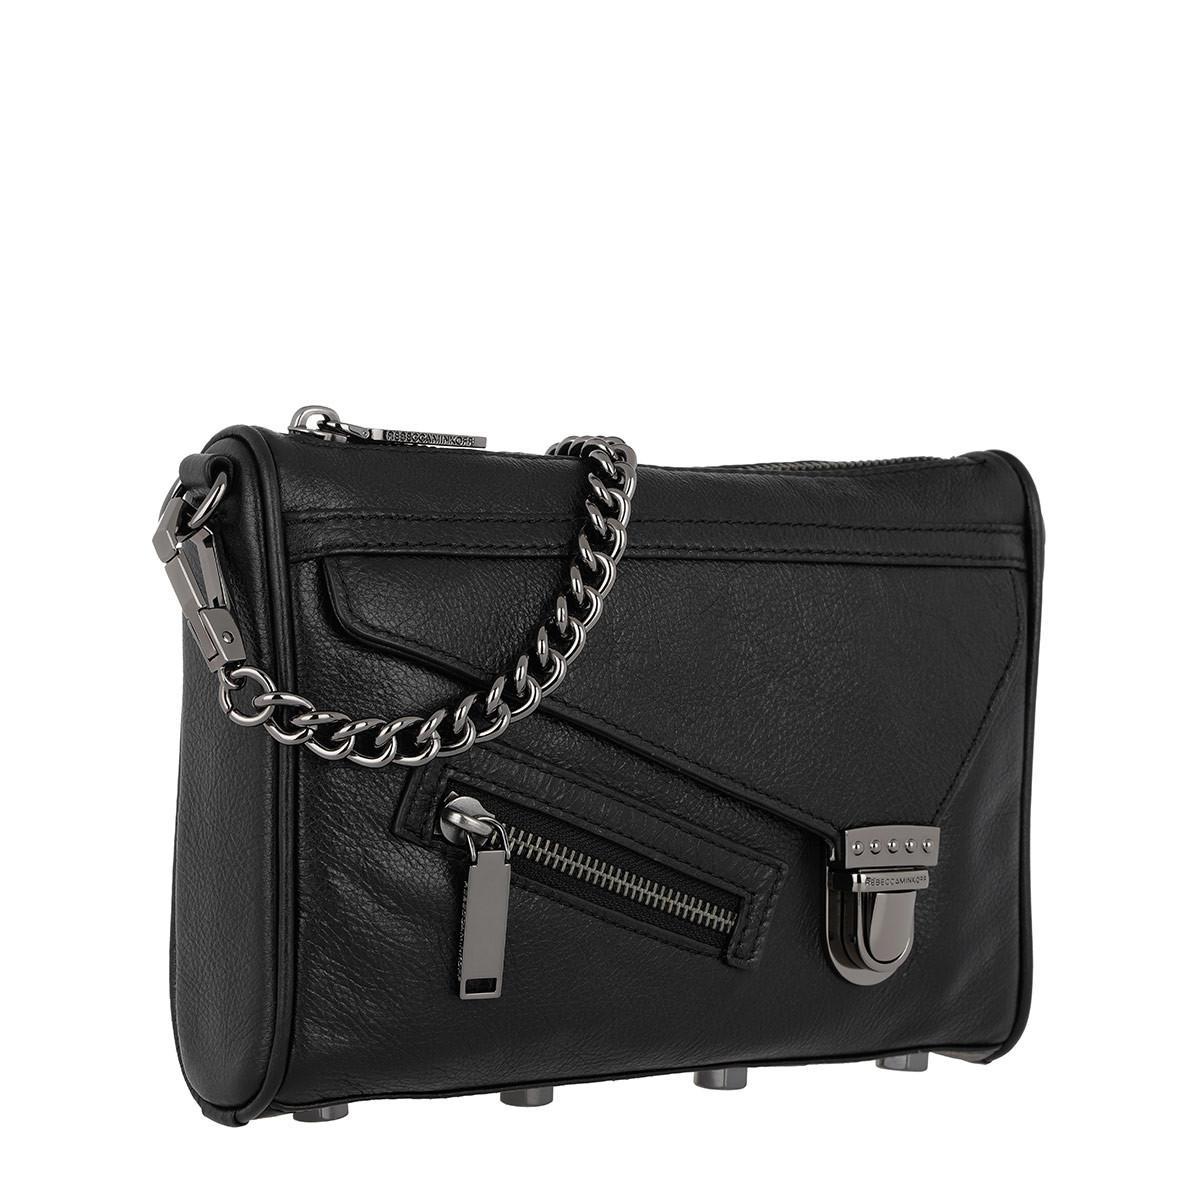 Rebecca Minkoff Leather Jamie Crossbody Black